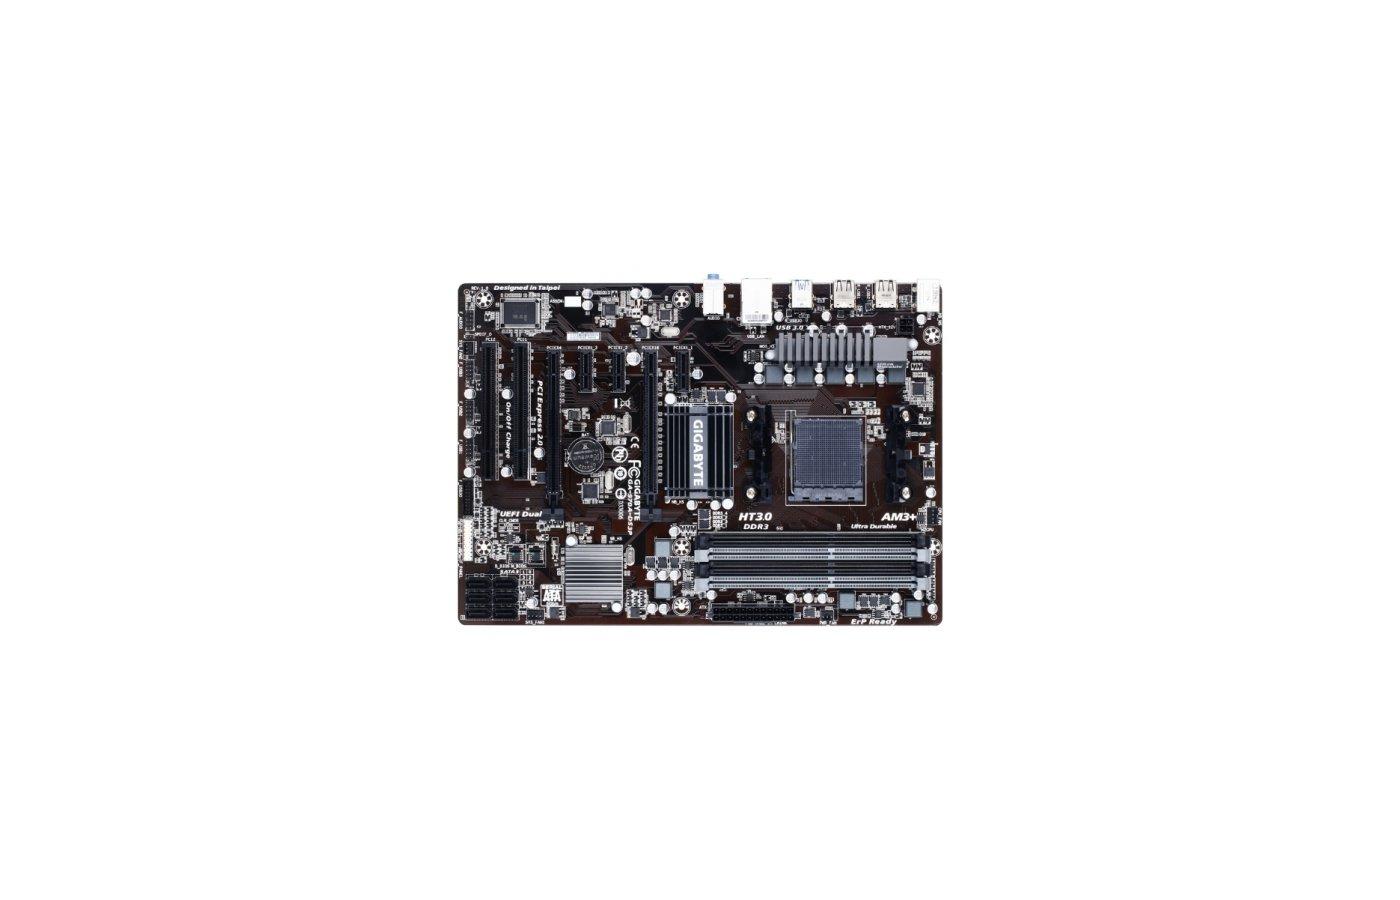 Материнская плата Gigabyte GA-970A-DS3P Soc-AM3+ AMD 970 4xDDR3 ATX AC`97 8ch(7.1)